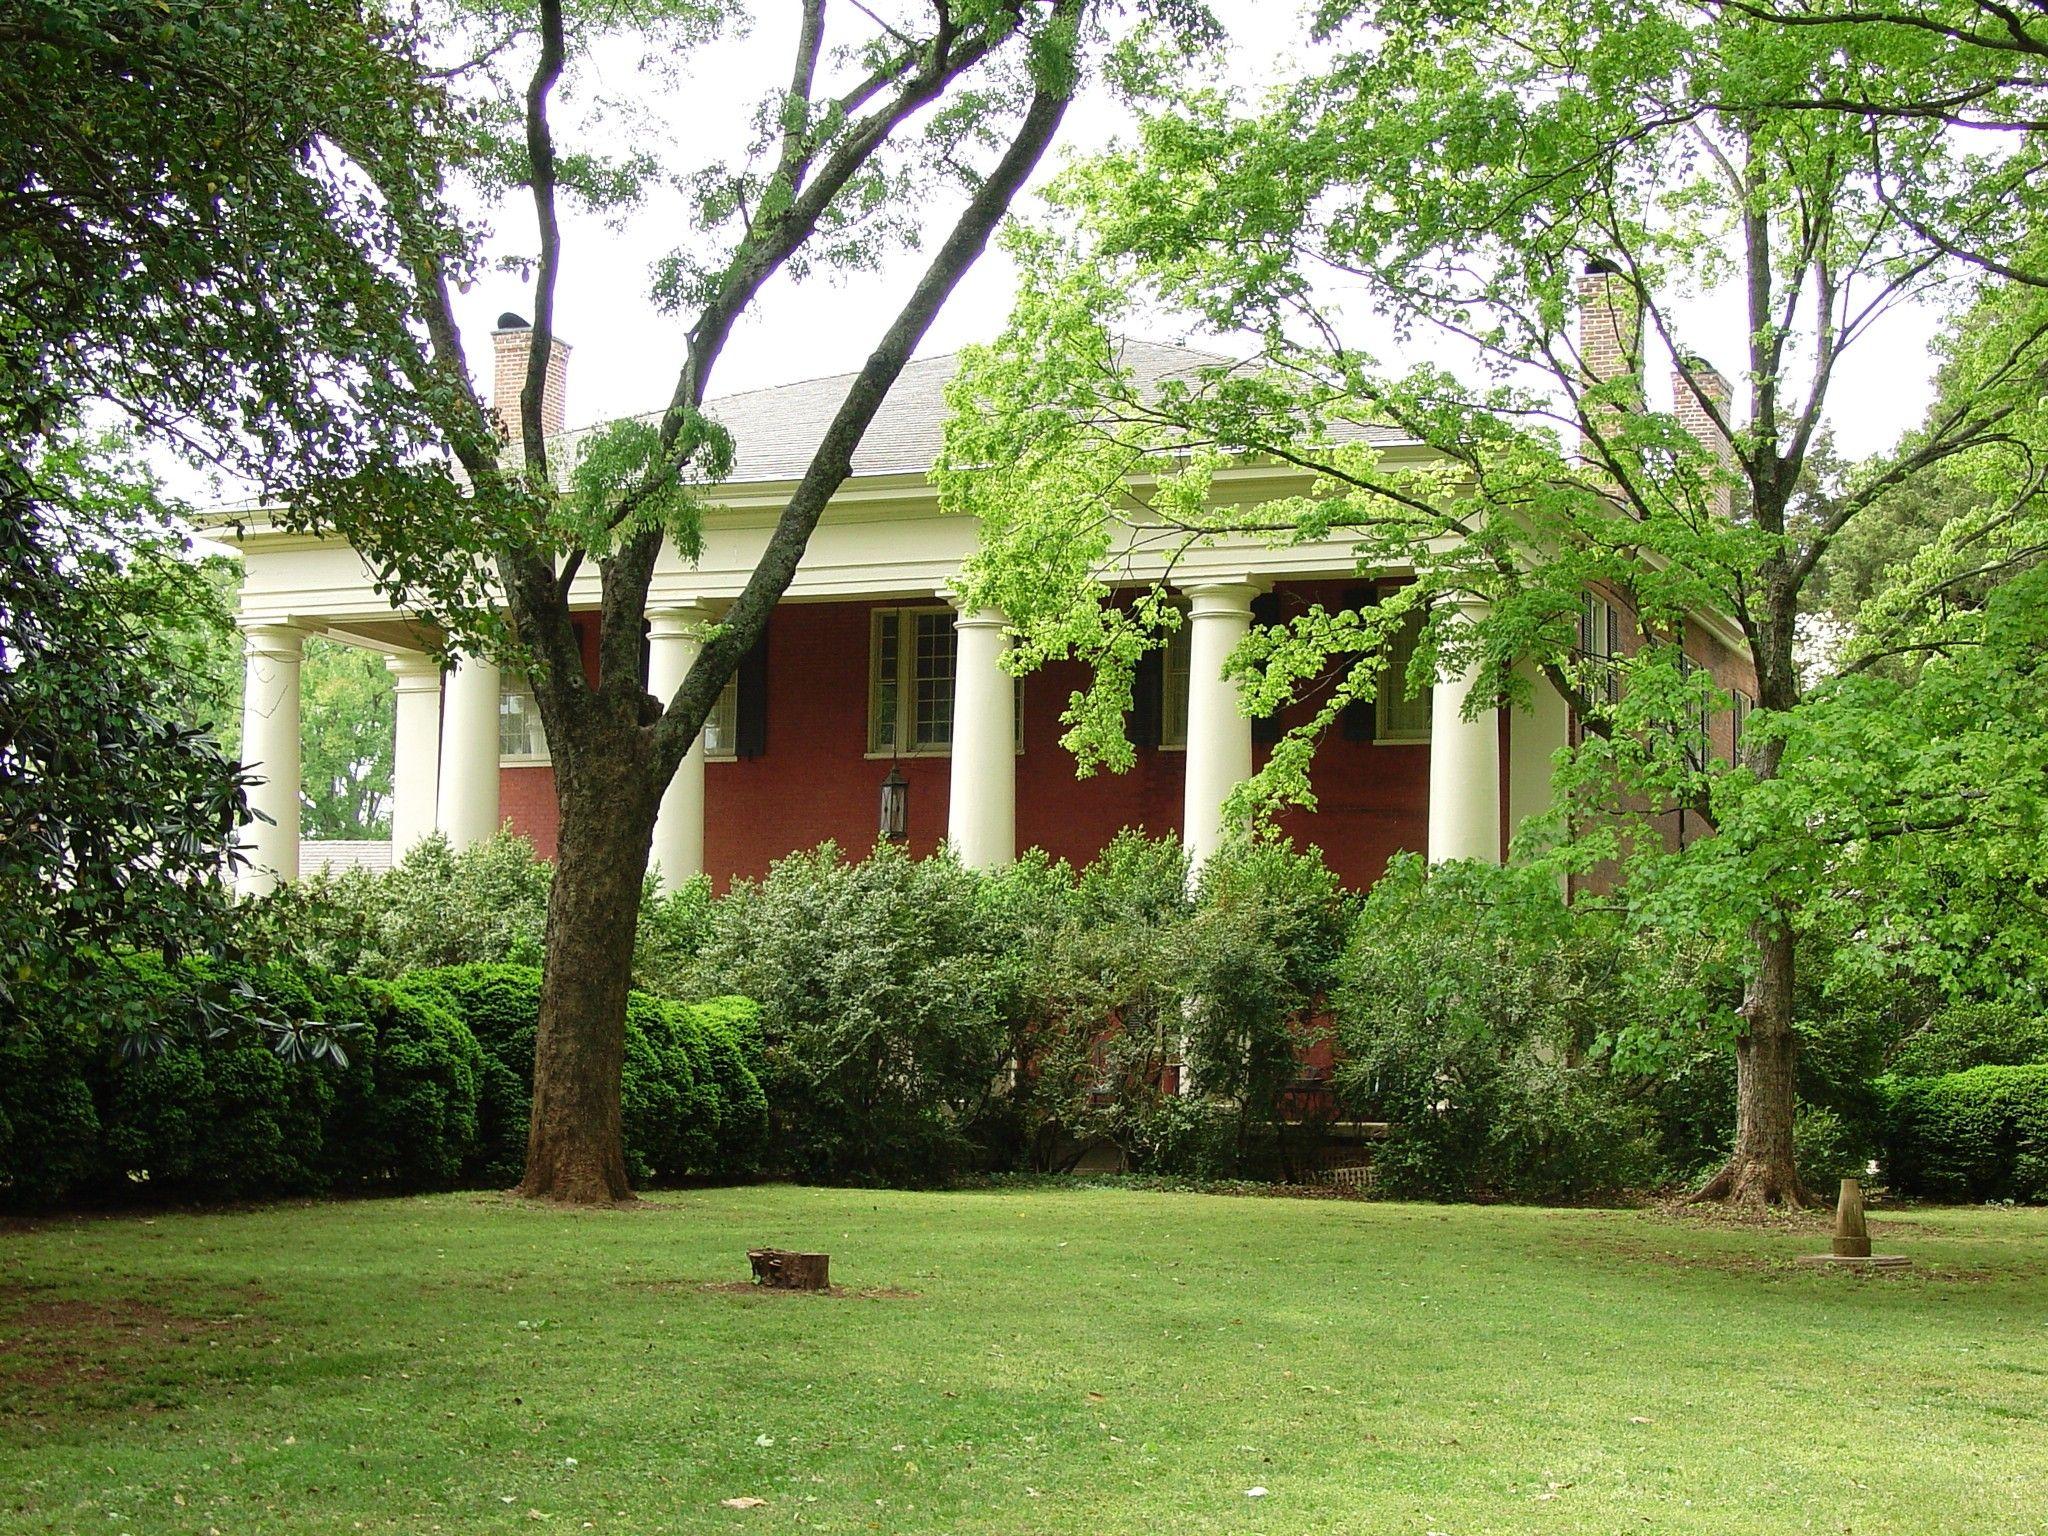 The historic home Govenor Thomas Bibb Belle Mina